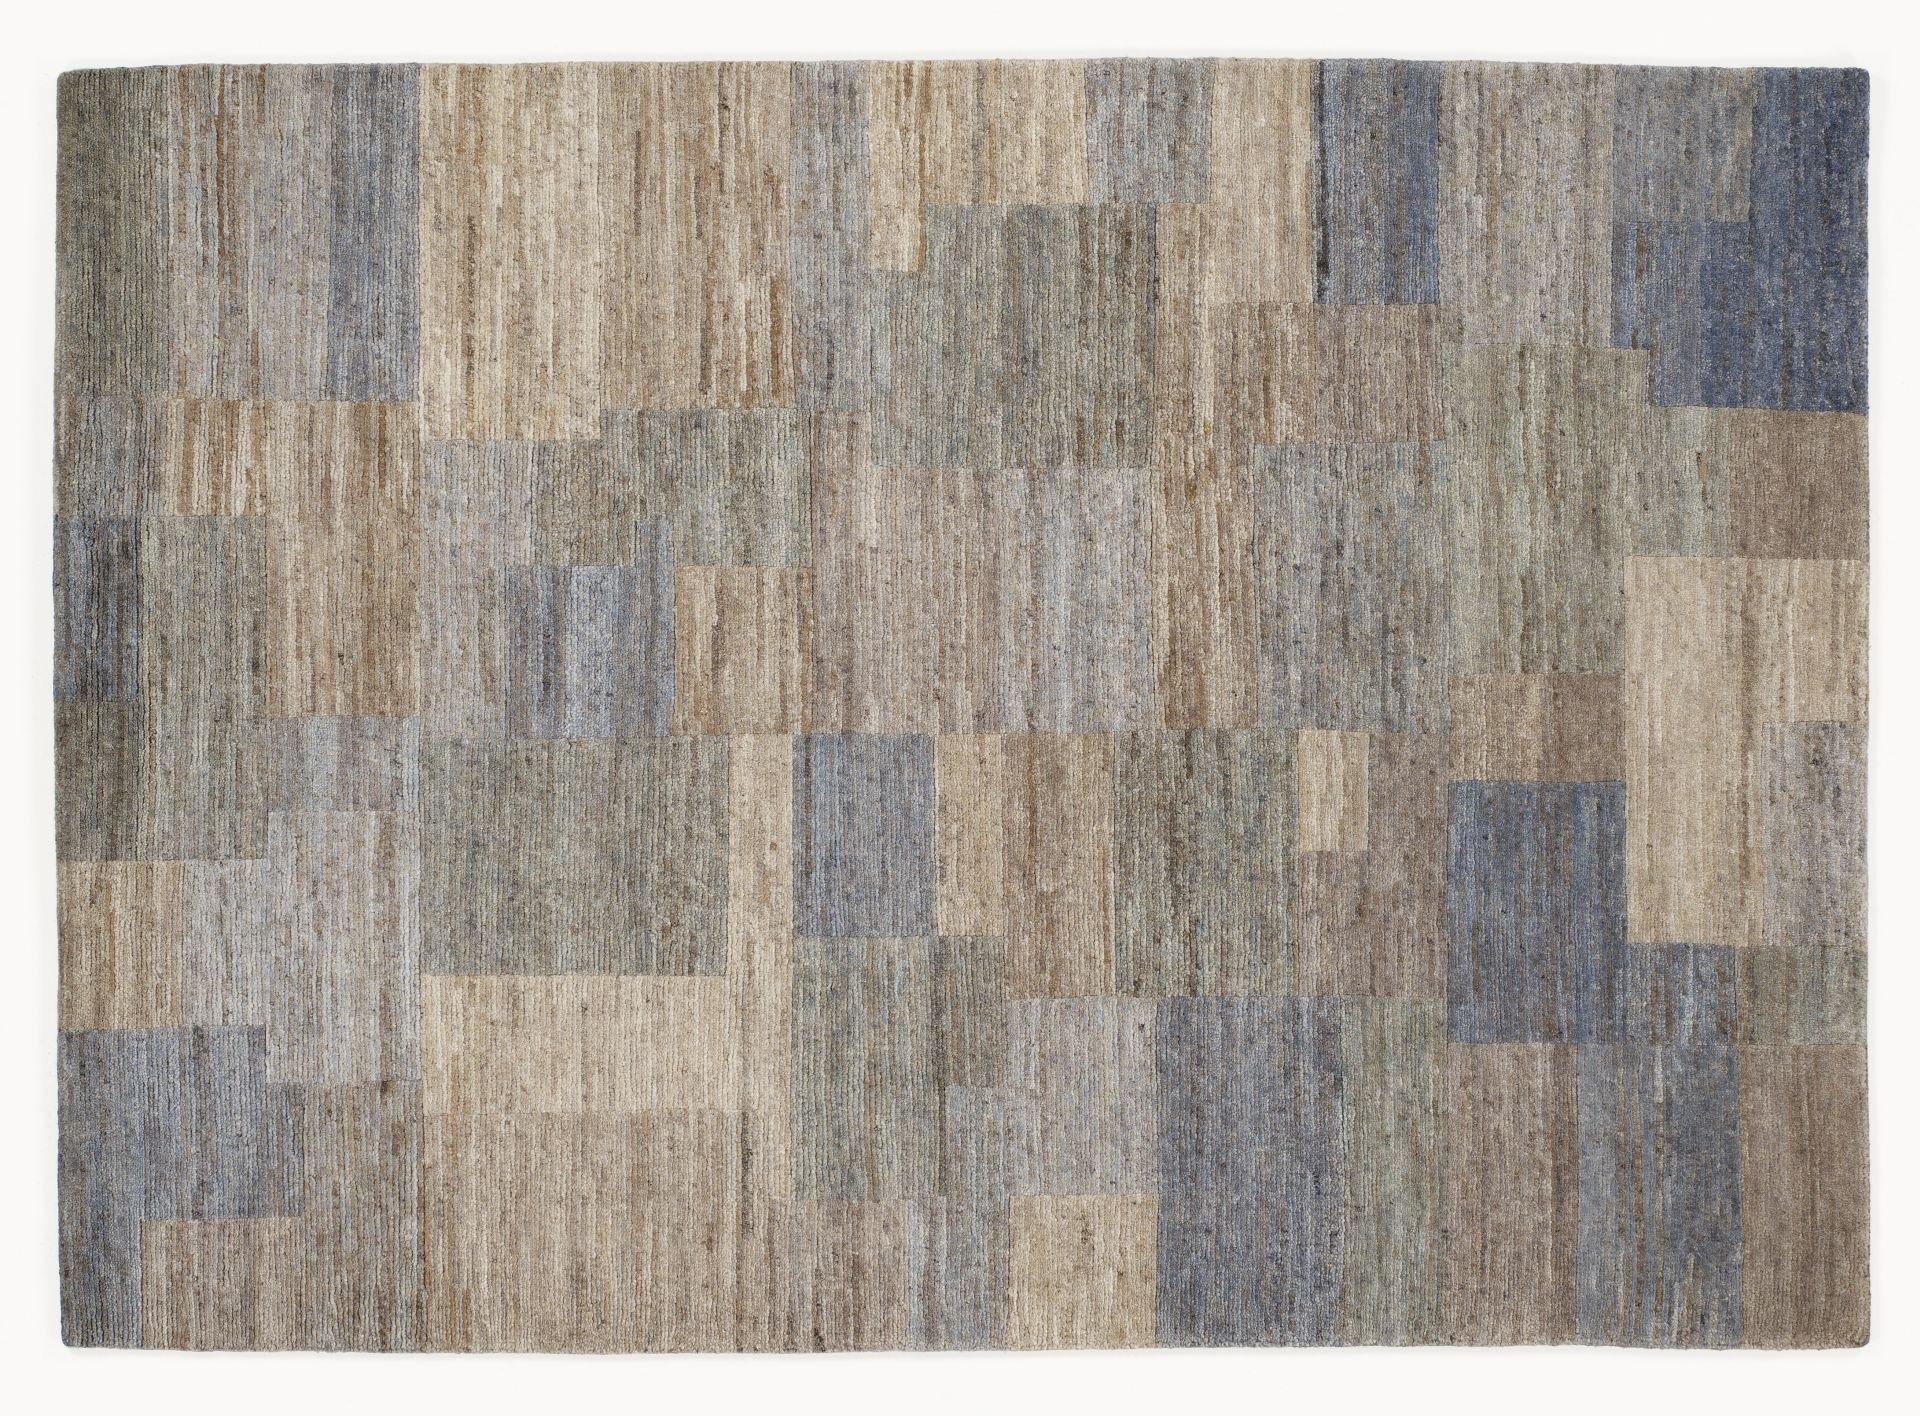 echter original handgeknüpfter Nepal-Teppich ELEGANT NEW LIMA silber-grau